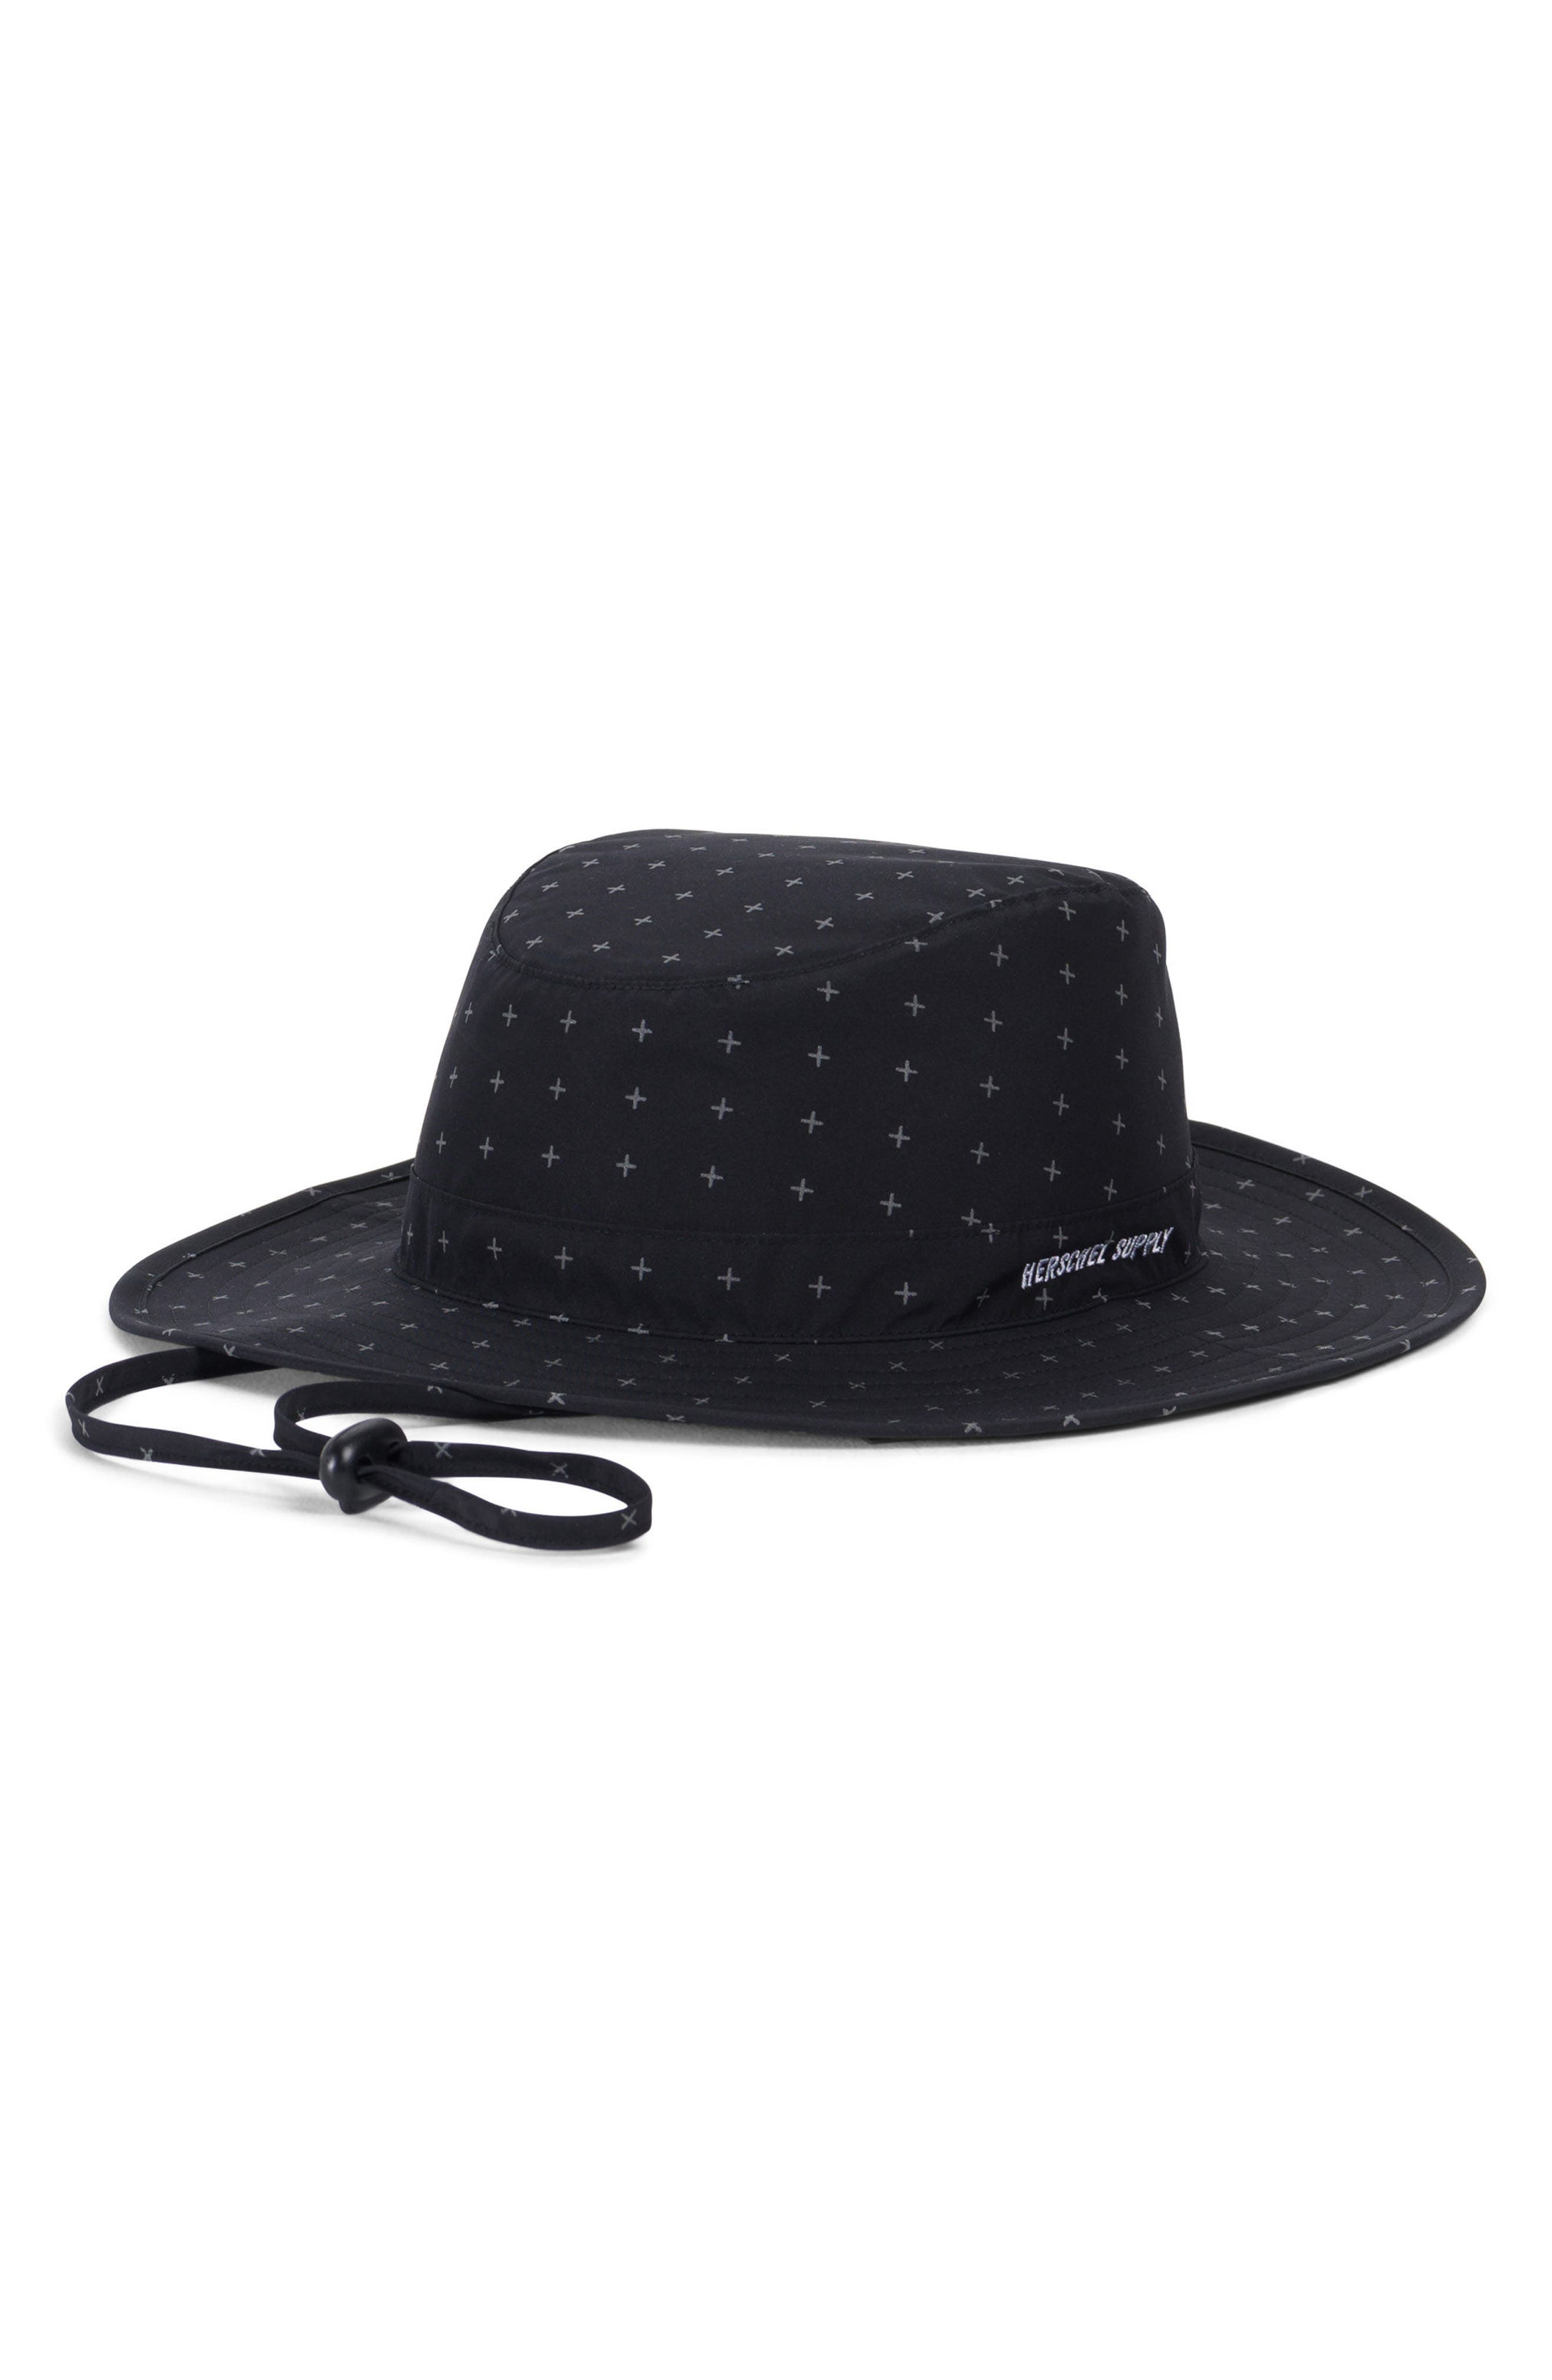 Creek Gore-Tex<sup>®</sup> Bucket Hat,                             Main thumbnail 1, color,                             008